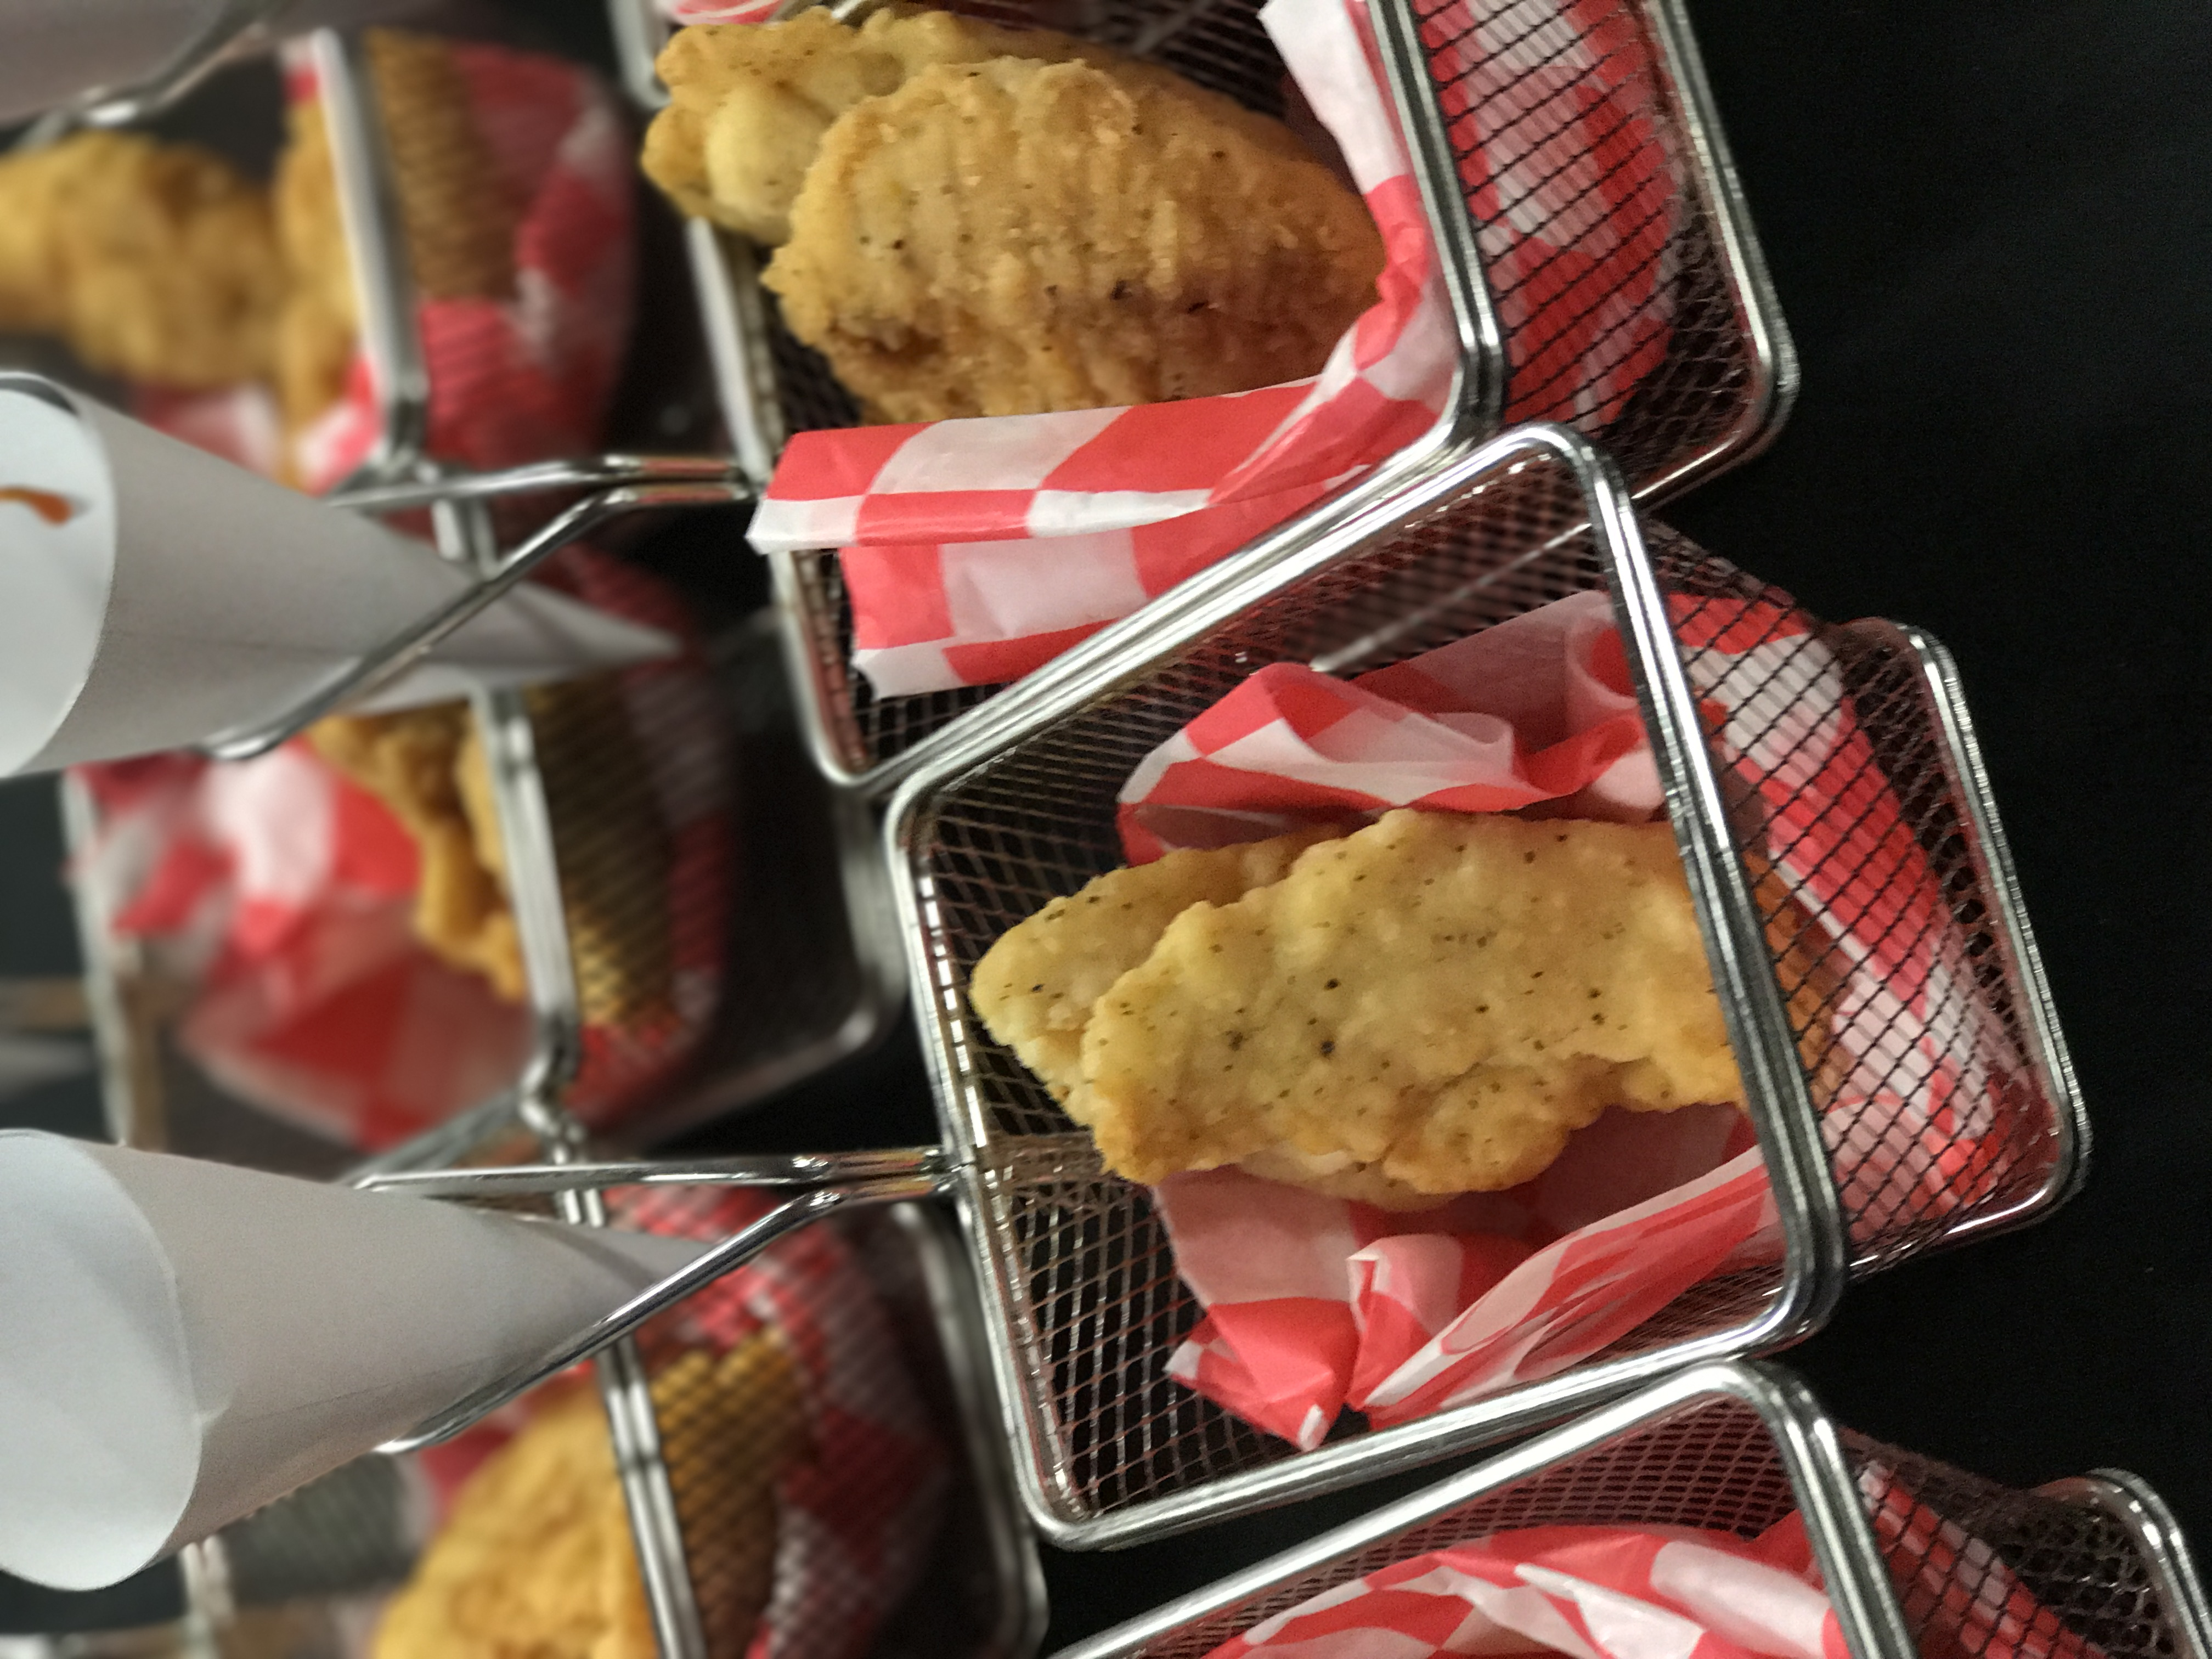 Chicken Tenders in a Basket